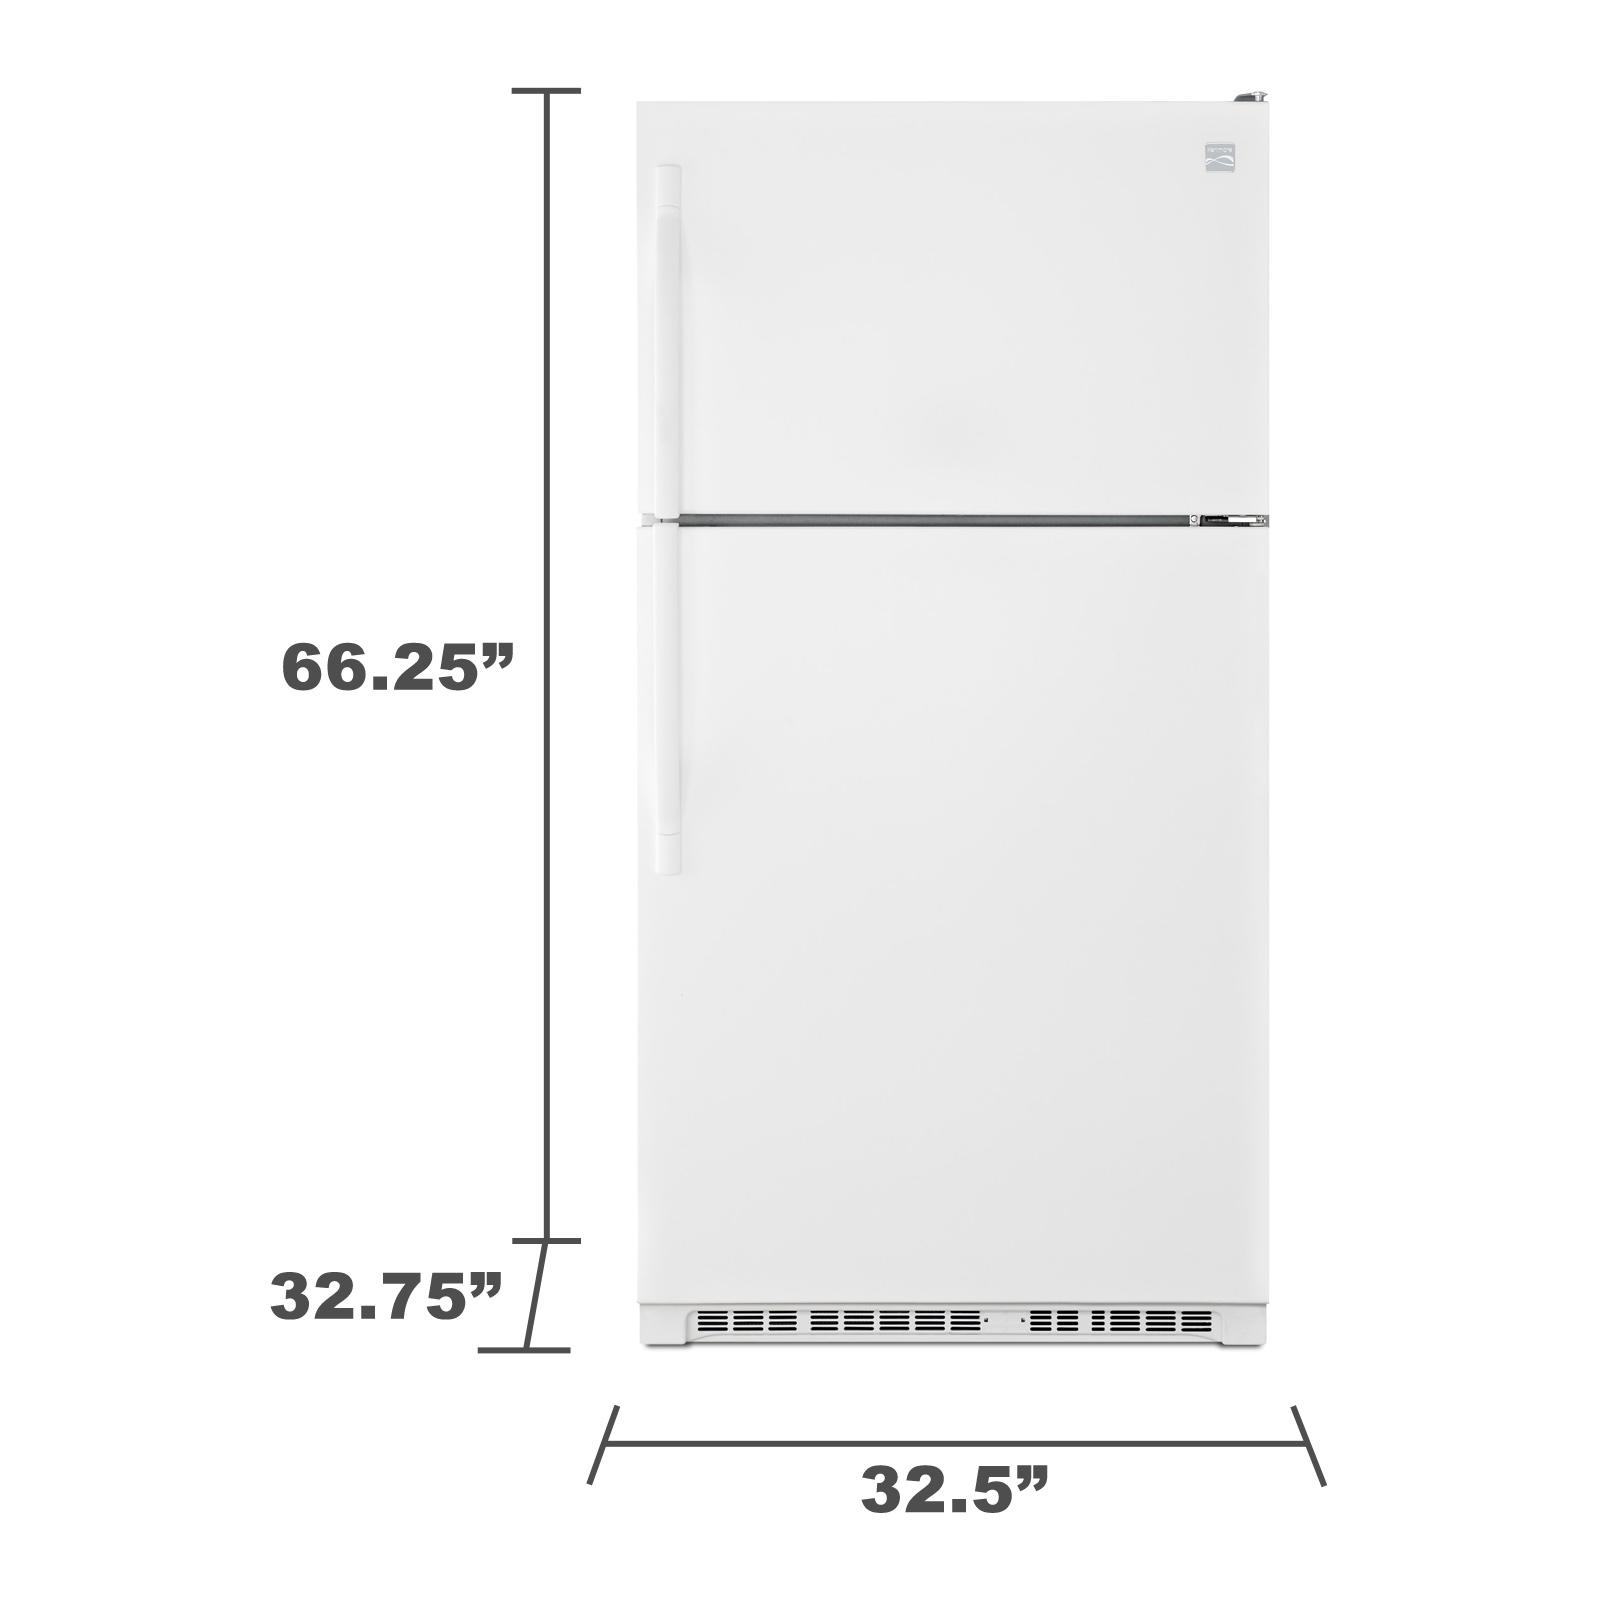 Kenmore 60212 20.5 cu. ft. Top Freezer Refrigerator - White